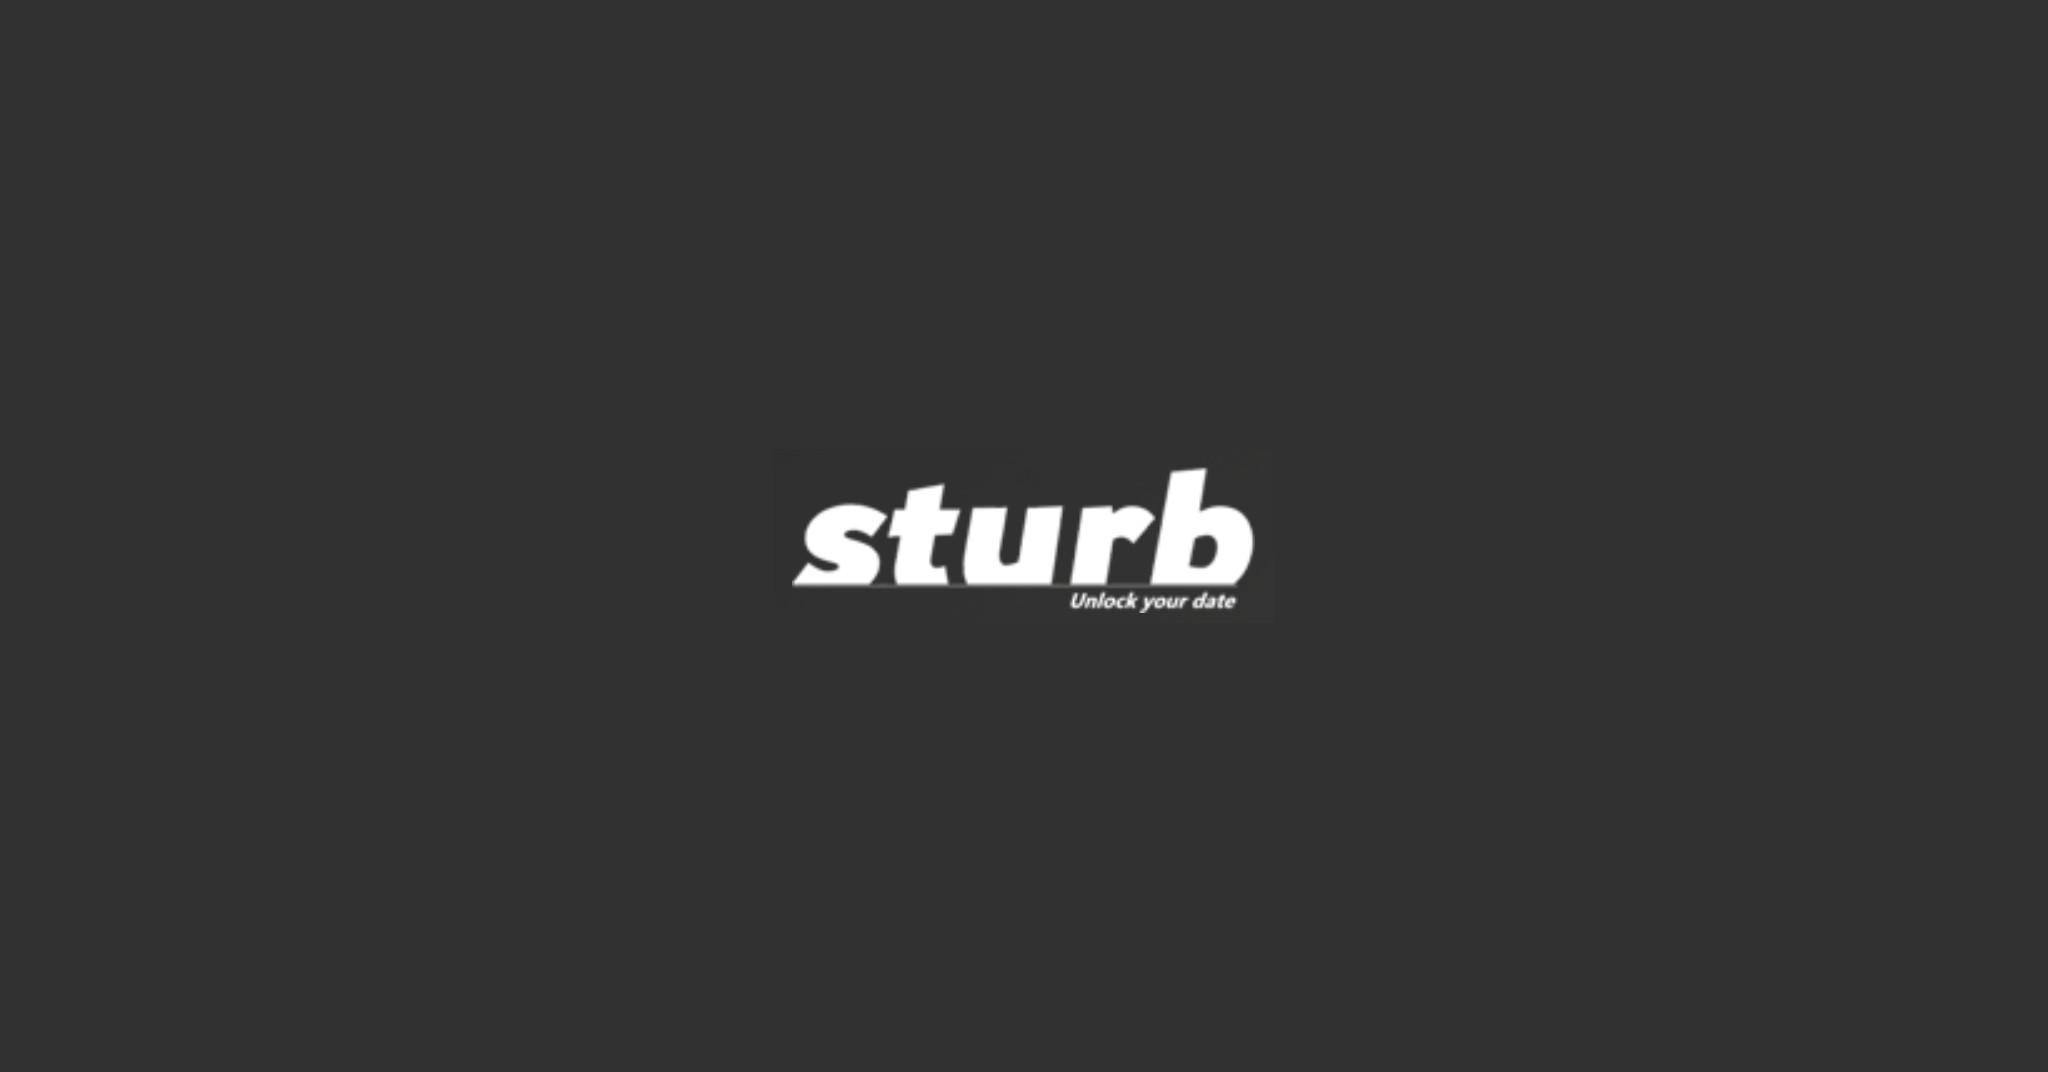 Sturb